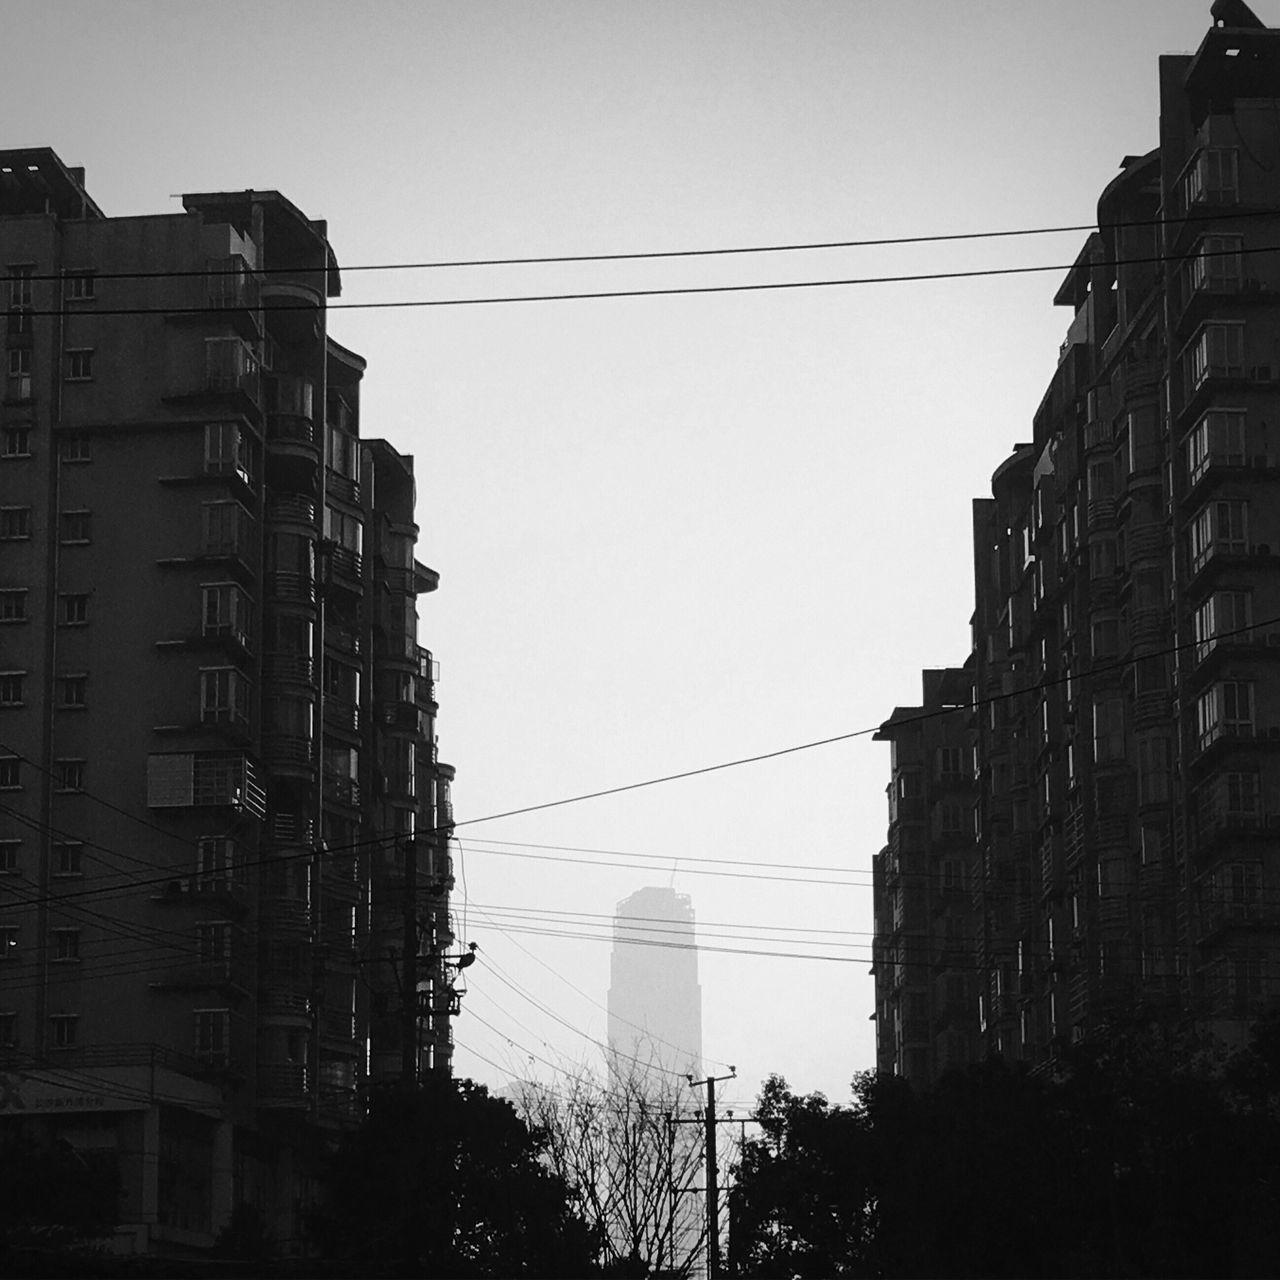 DC Dcchang Blackandwhite Blackandwhite Photography Black & White Buildings & Sky Light And Shadow Hunan Changsha China